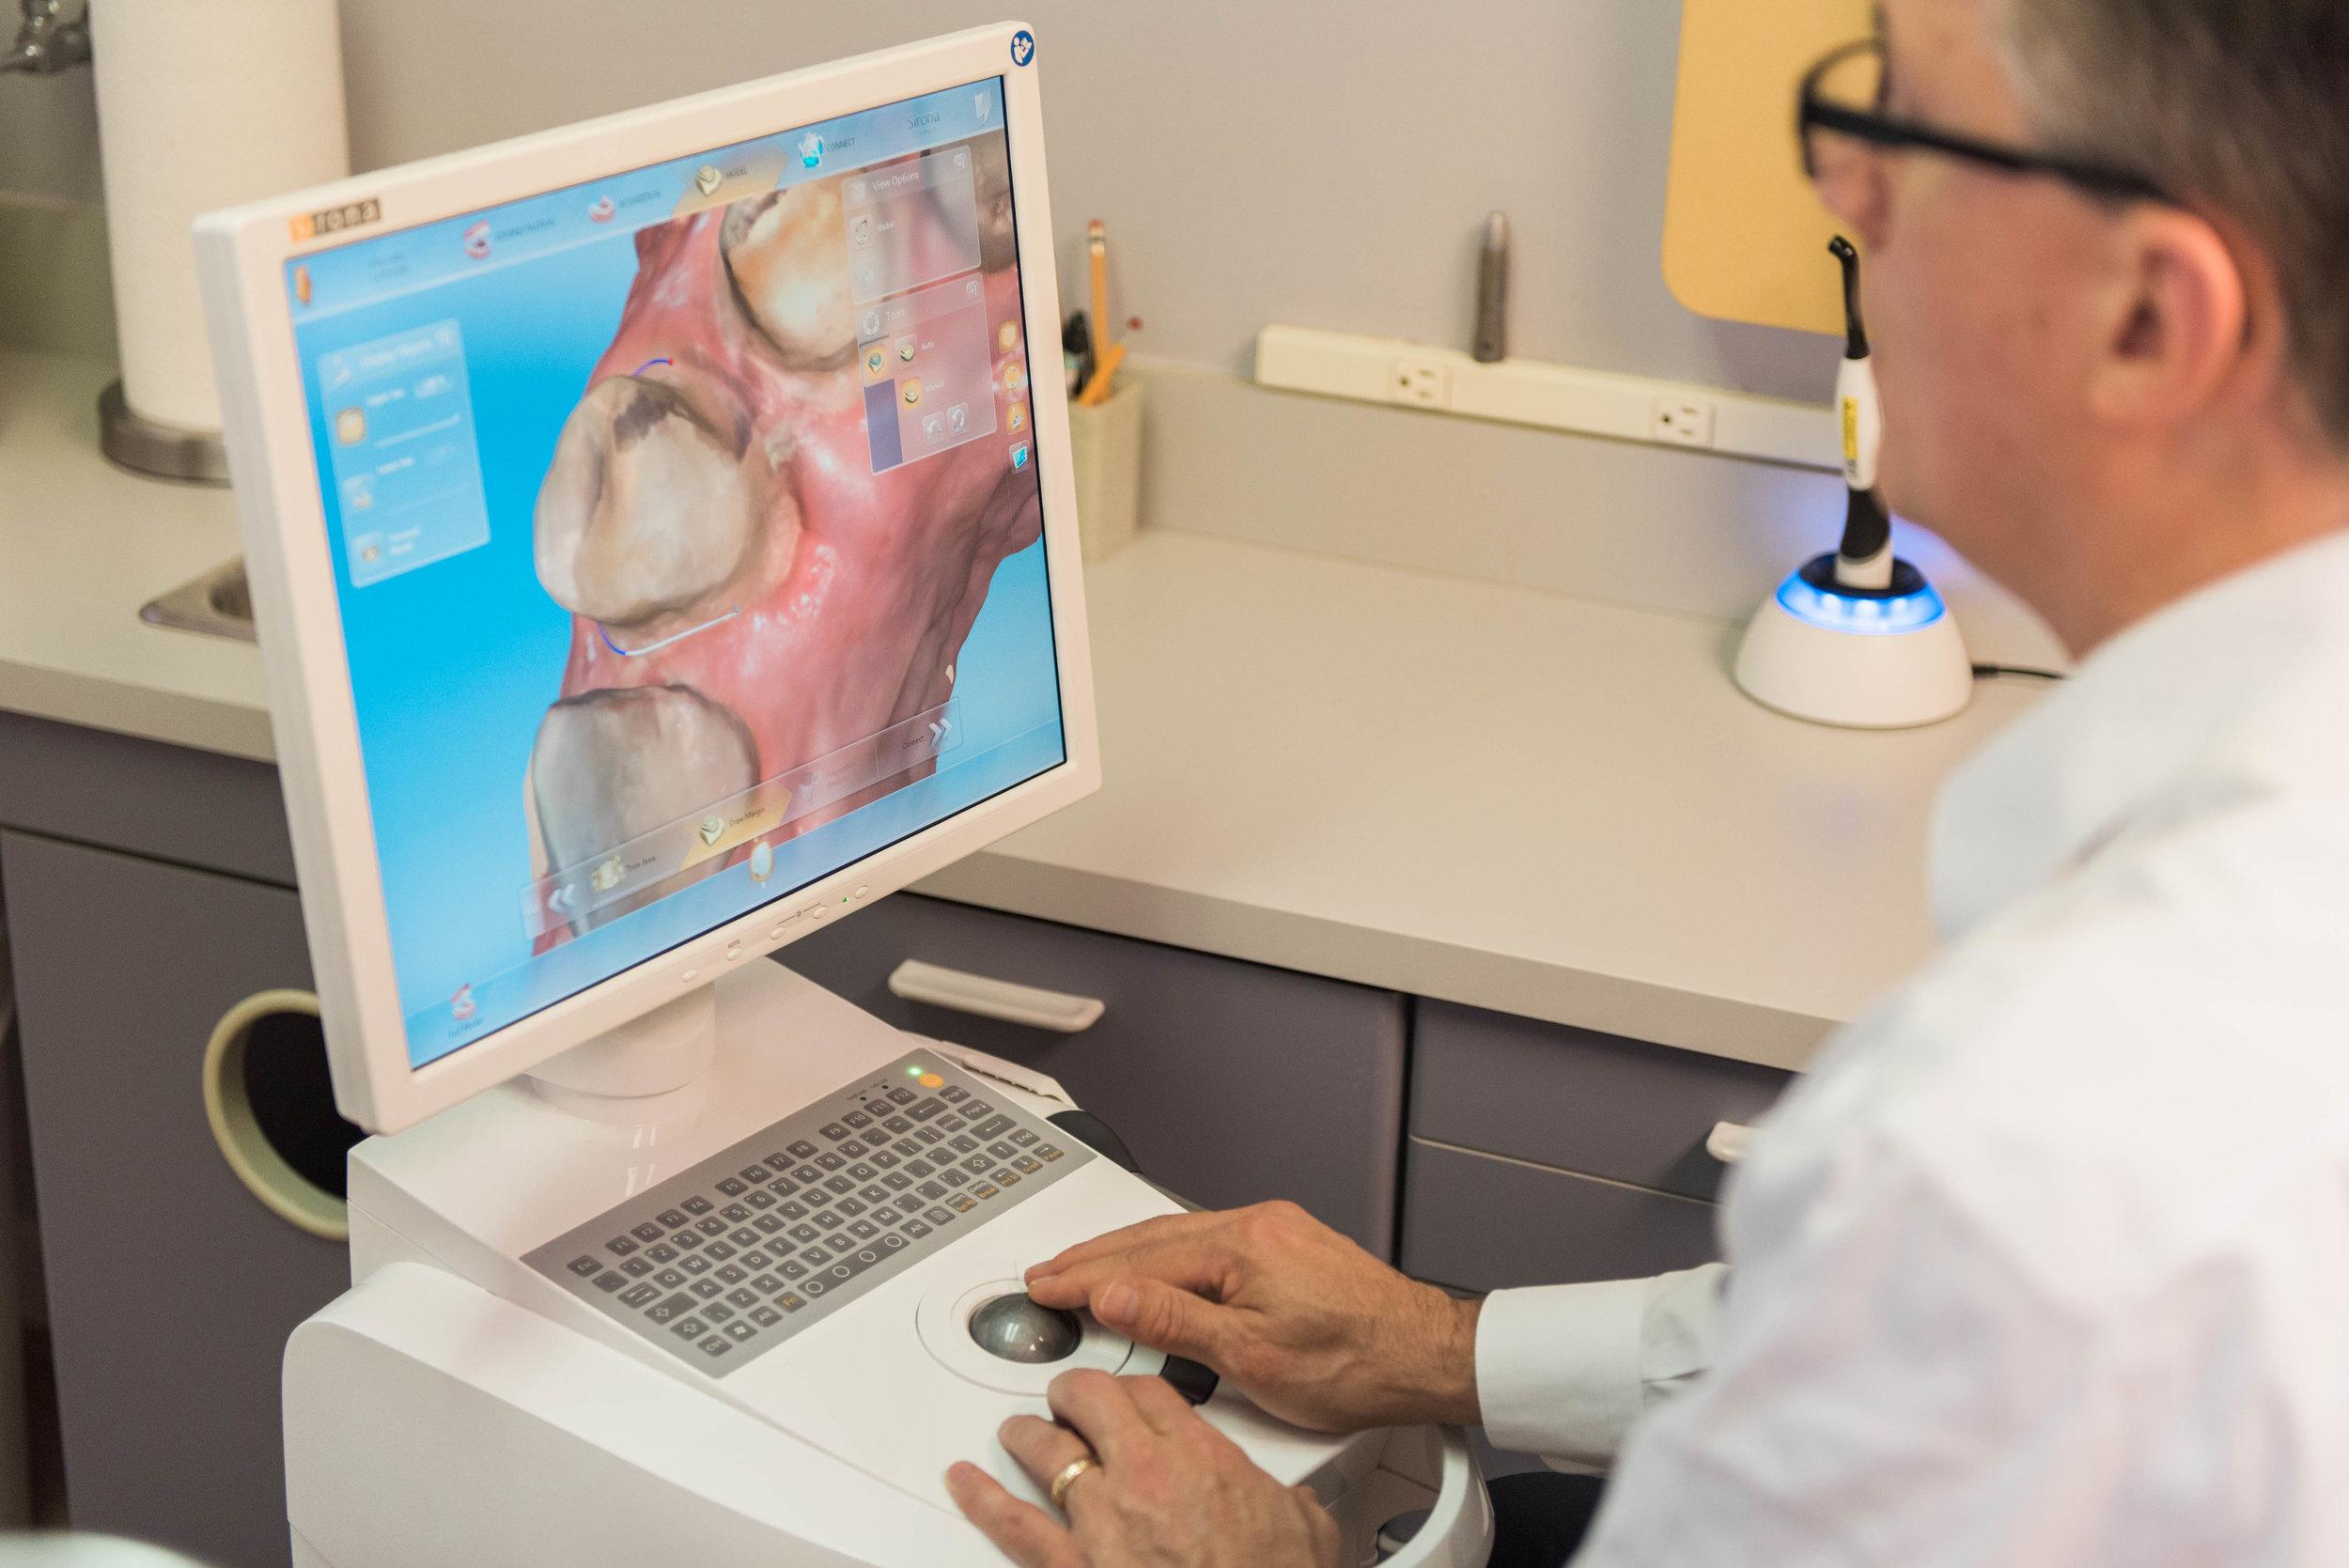 Implant technology